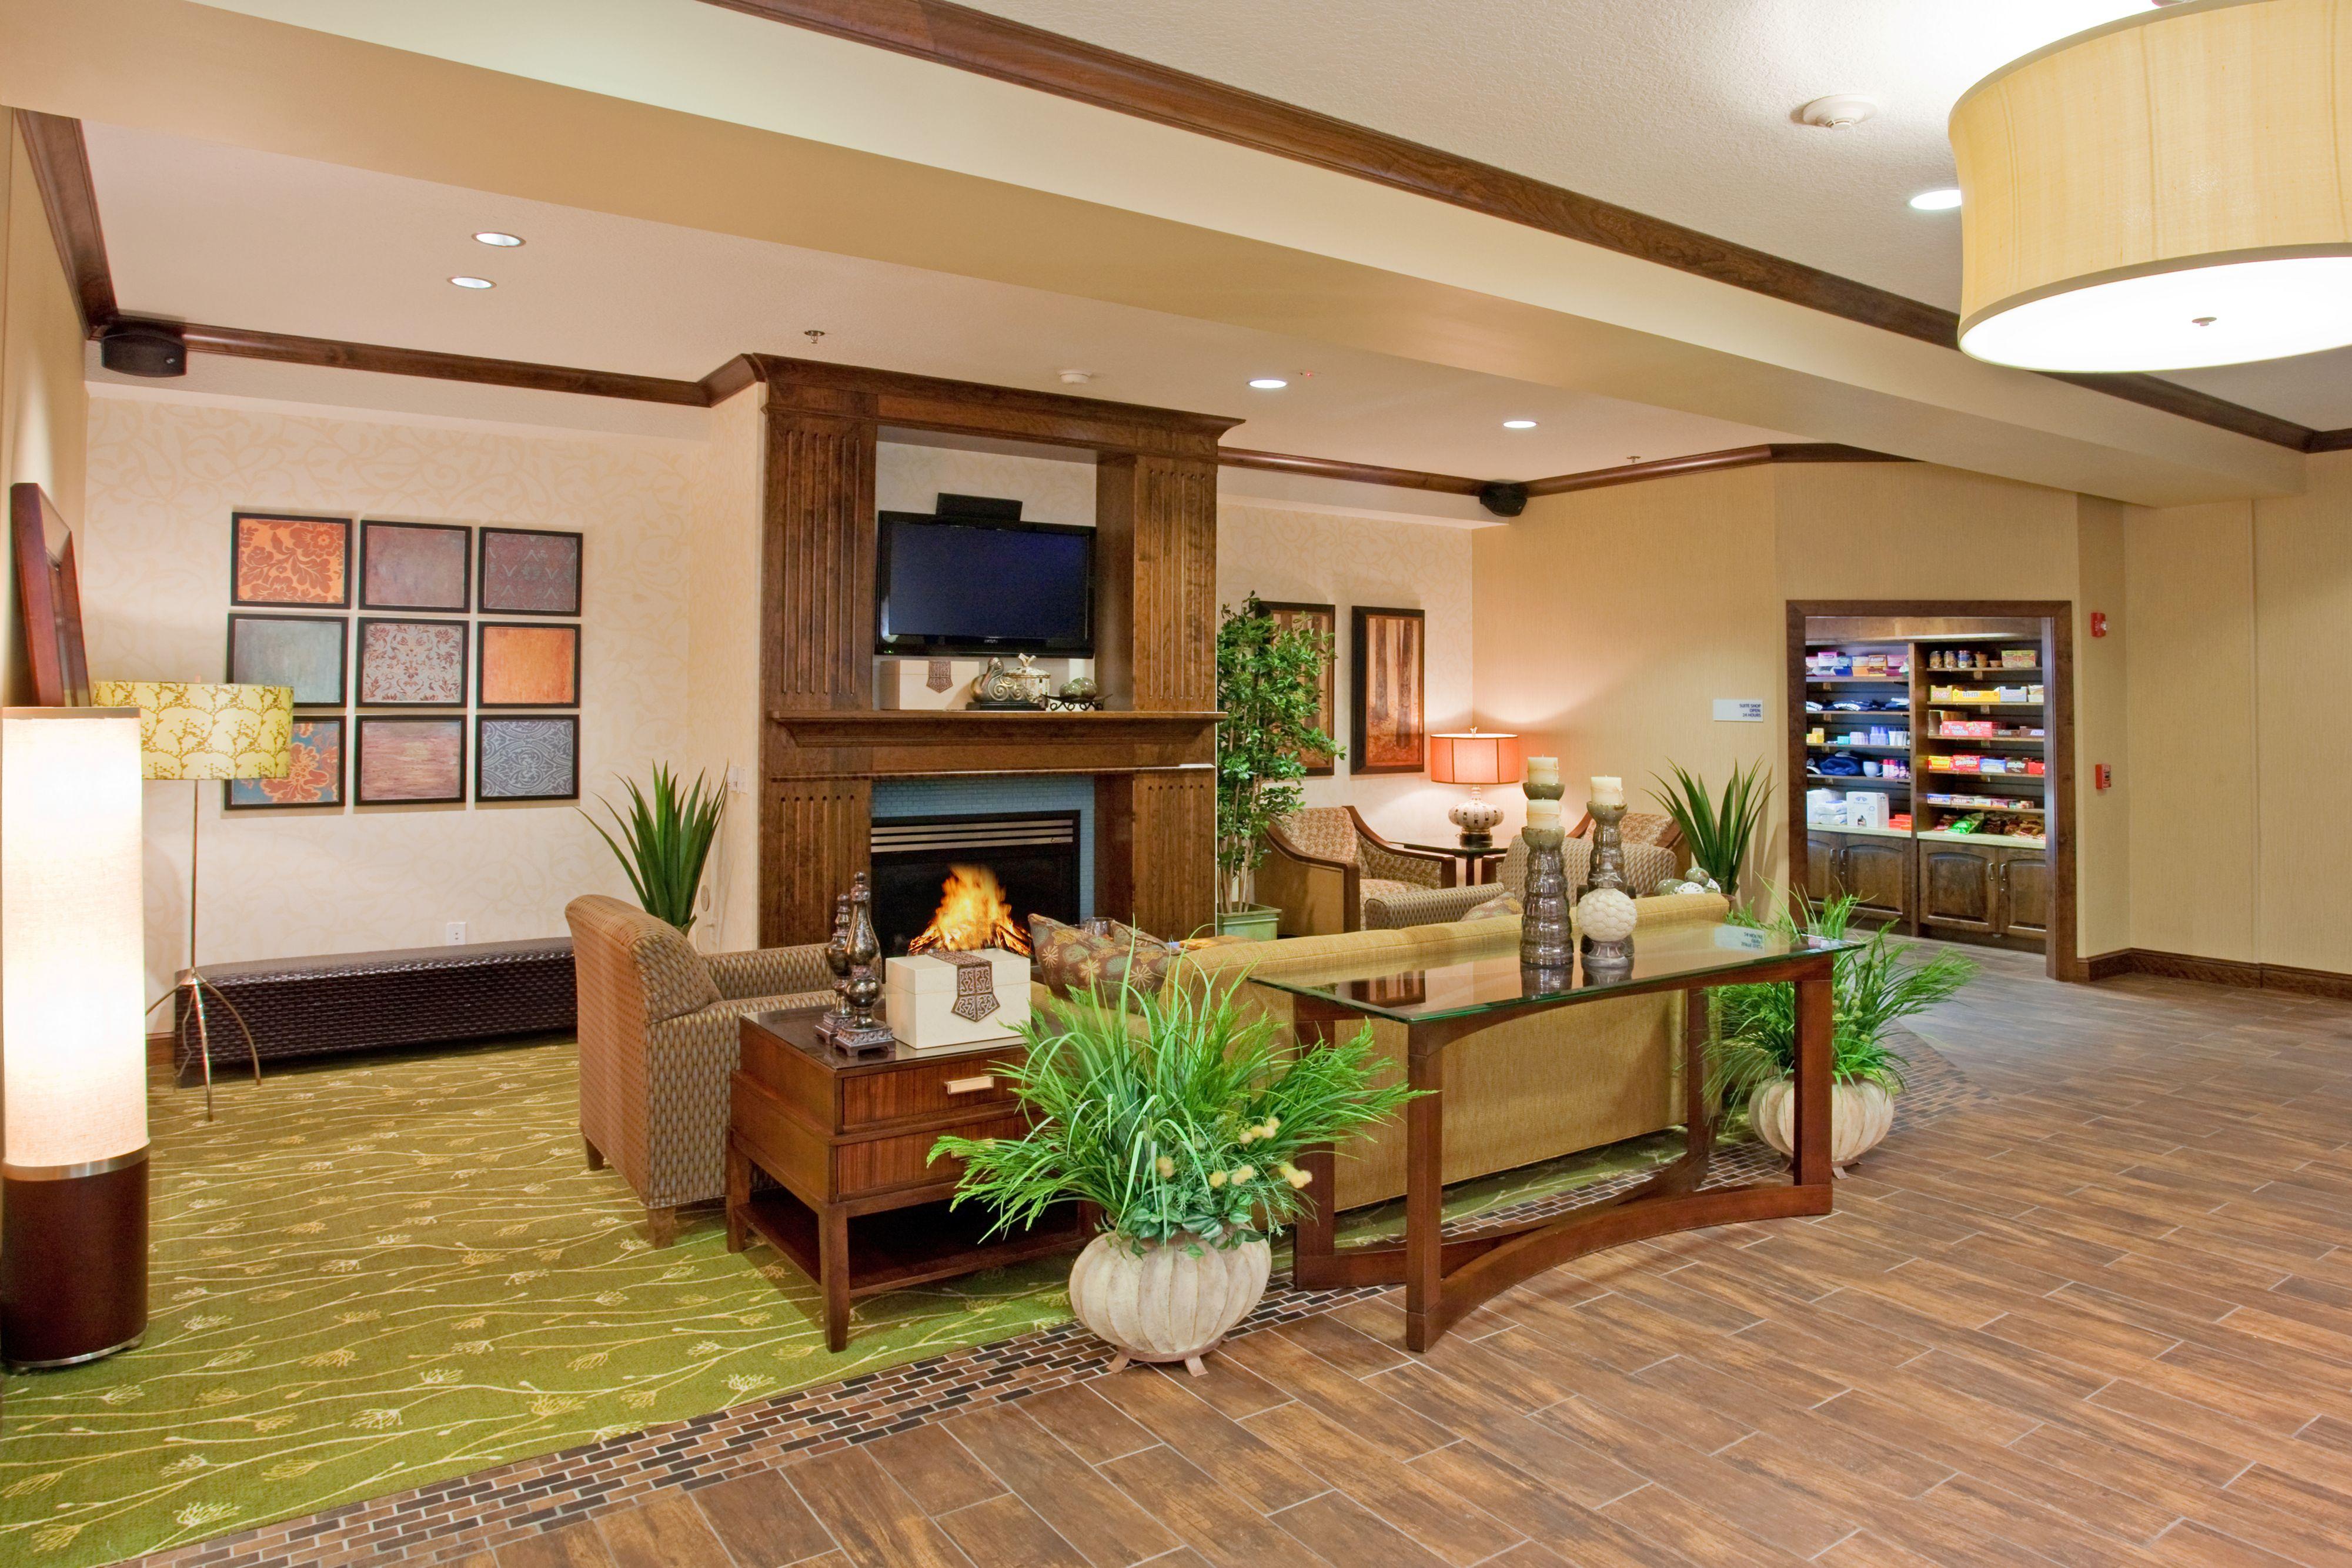 Holiday Inn Express & Suites Logan image 4